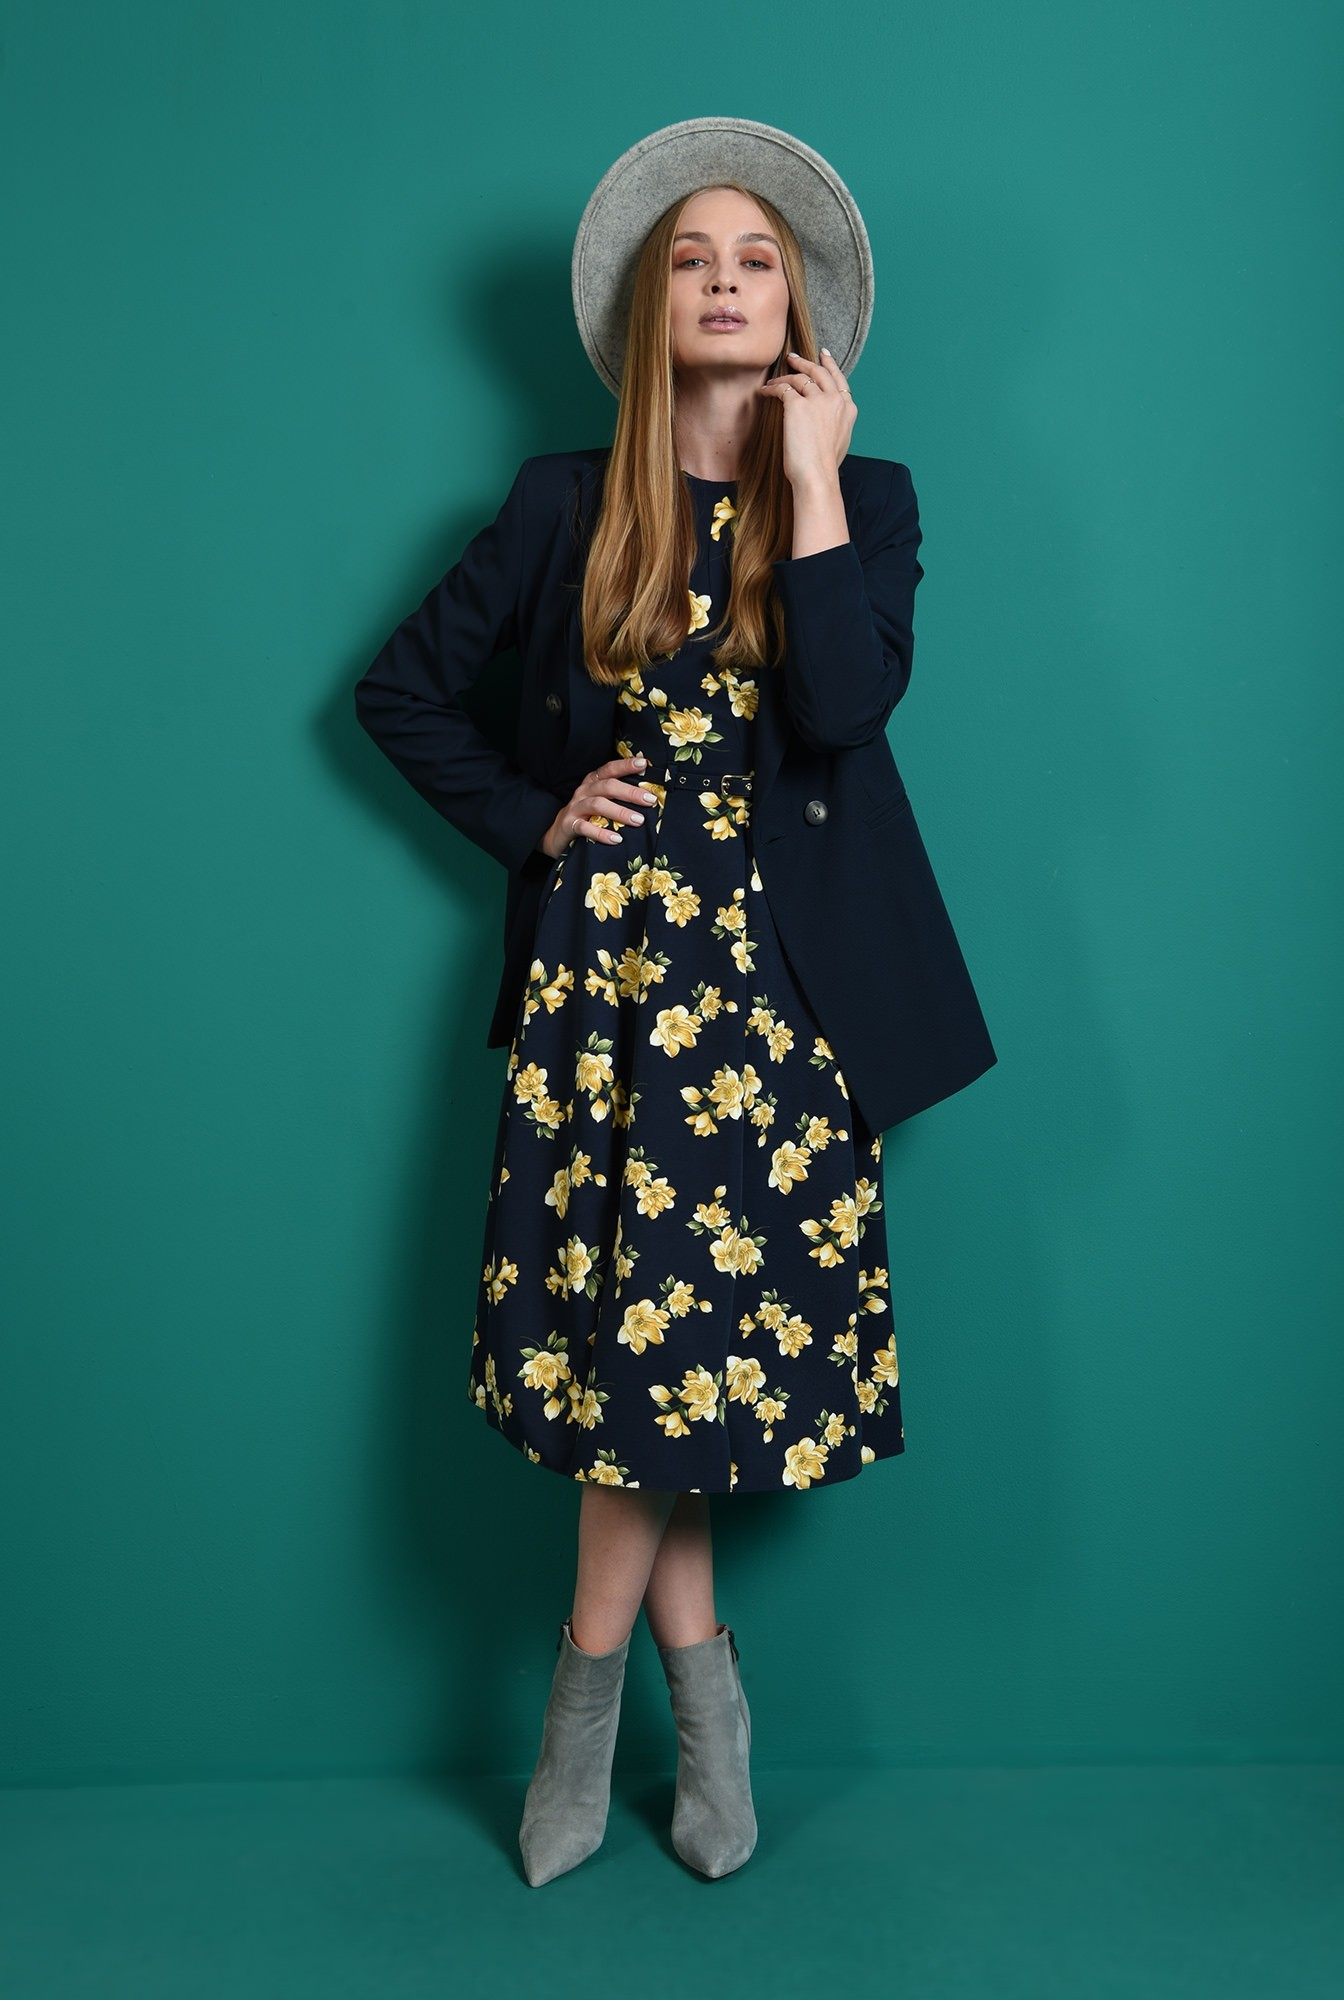 0 - rochie bleumarin, evazata, cu mptive florale